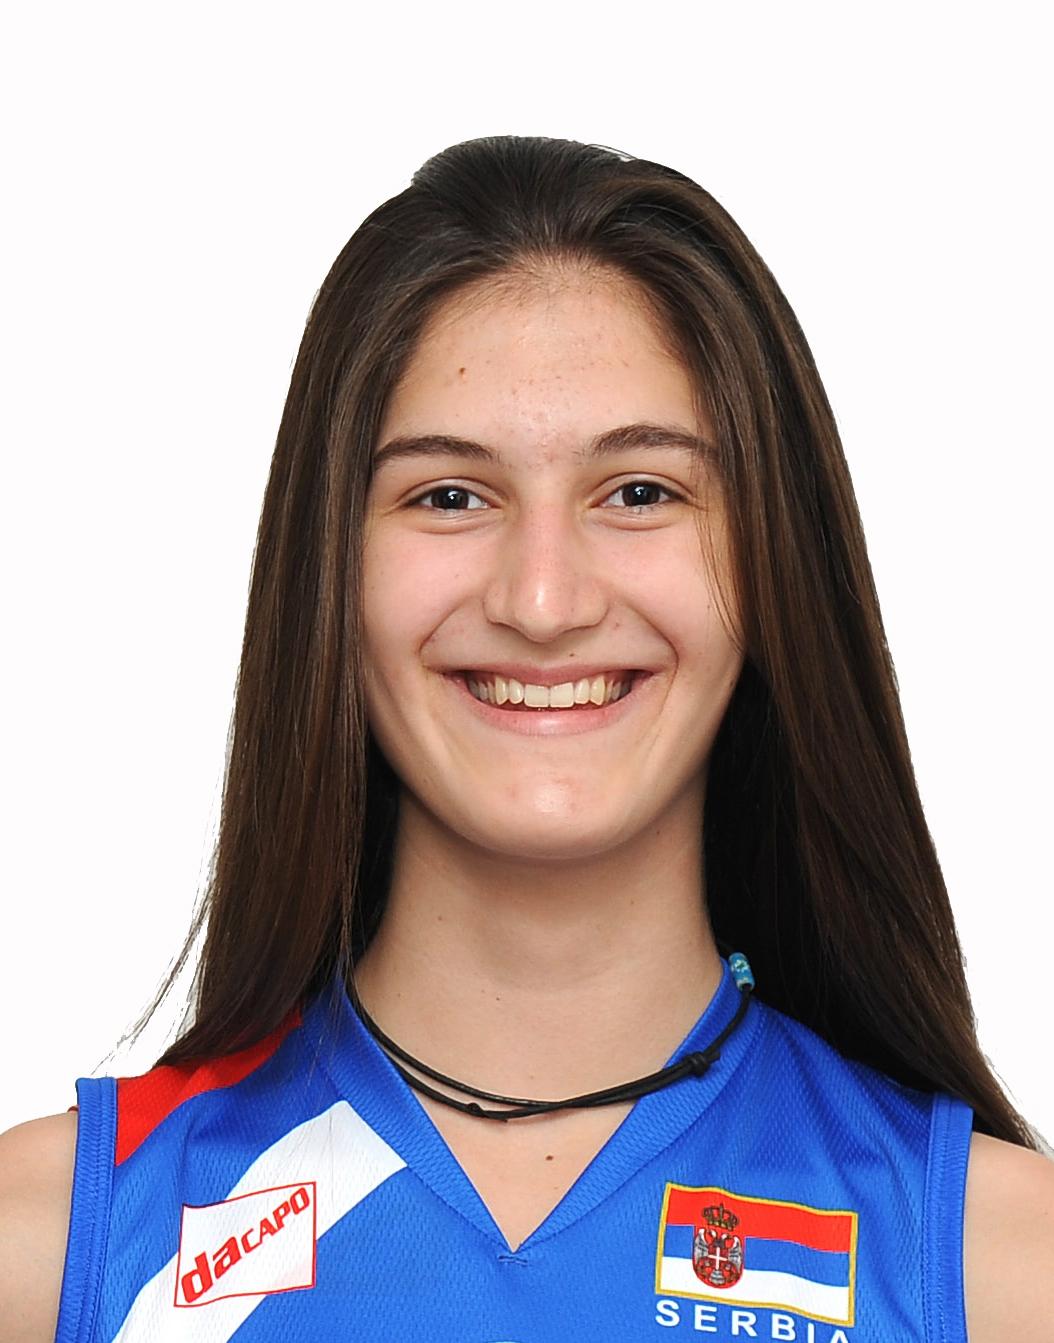 Tamara Radmilovic